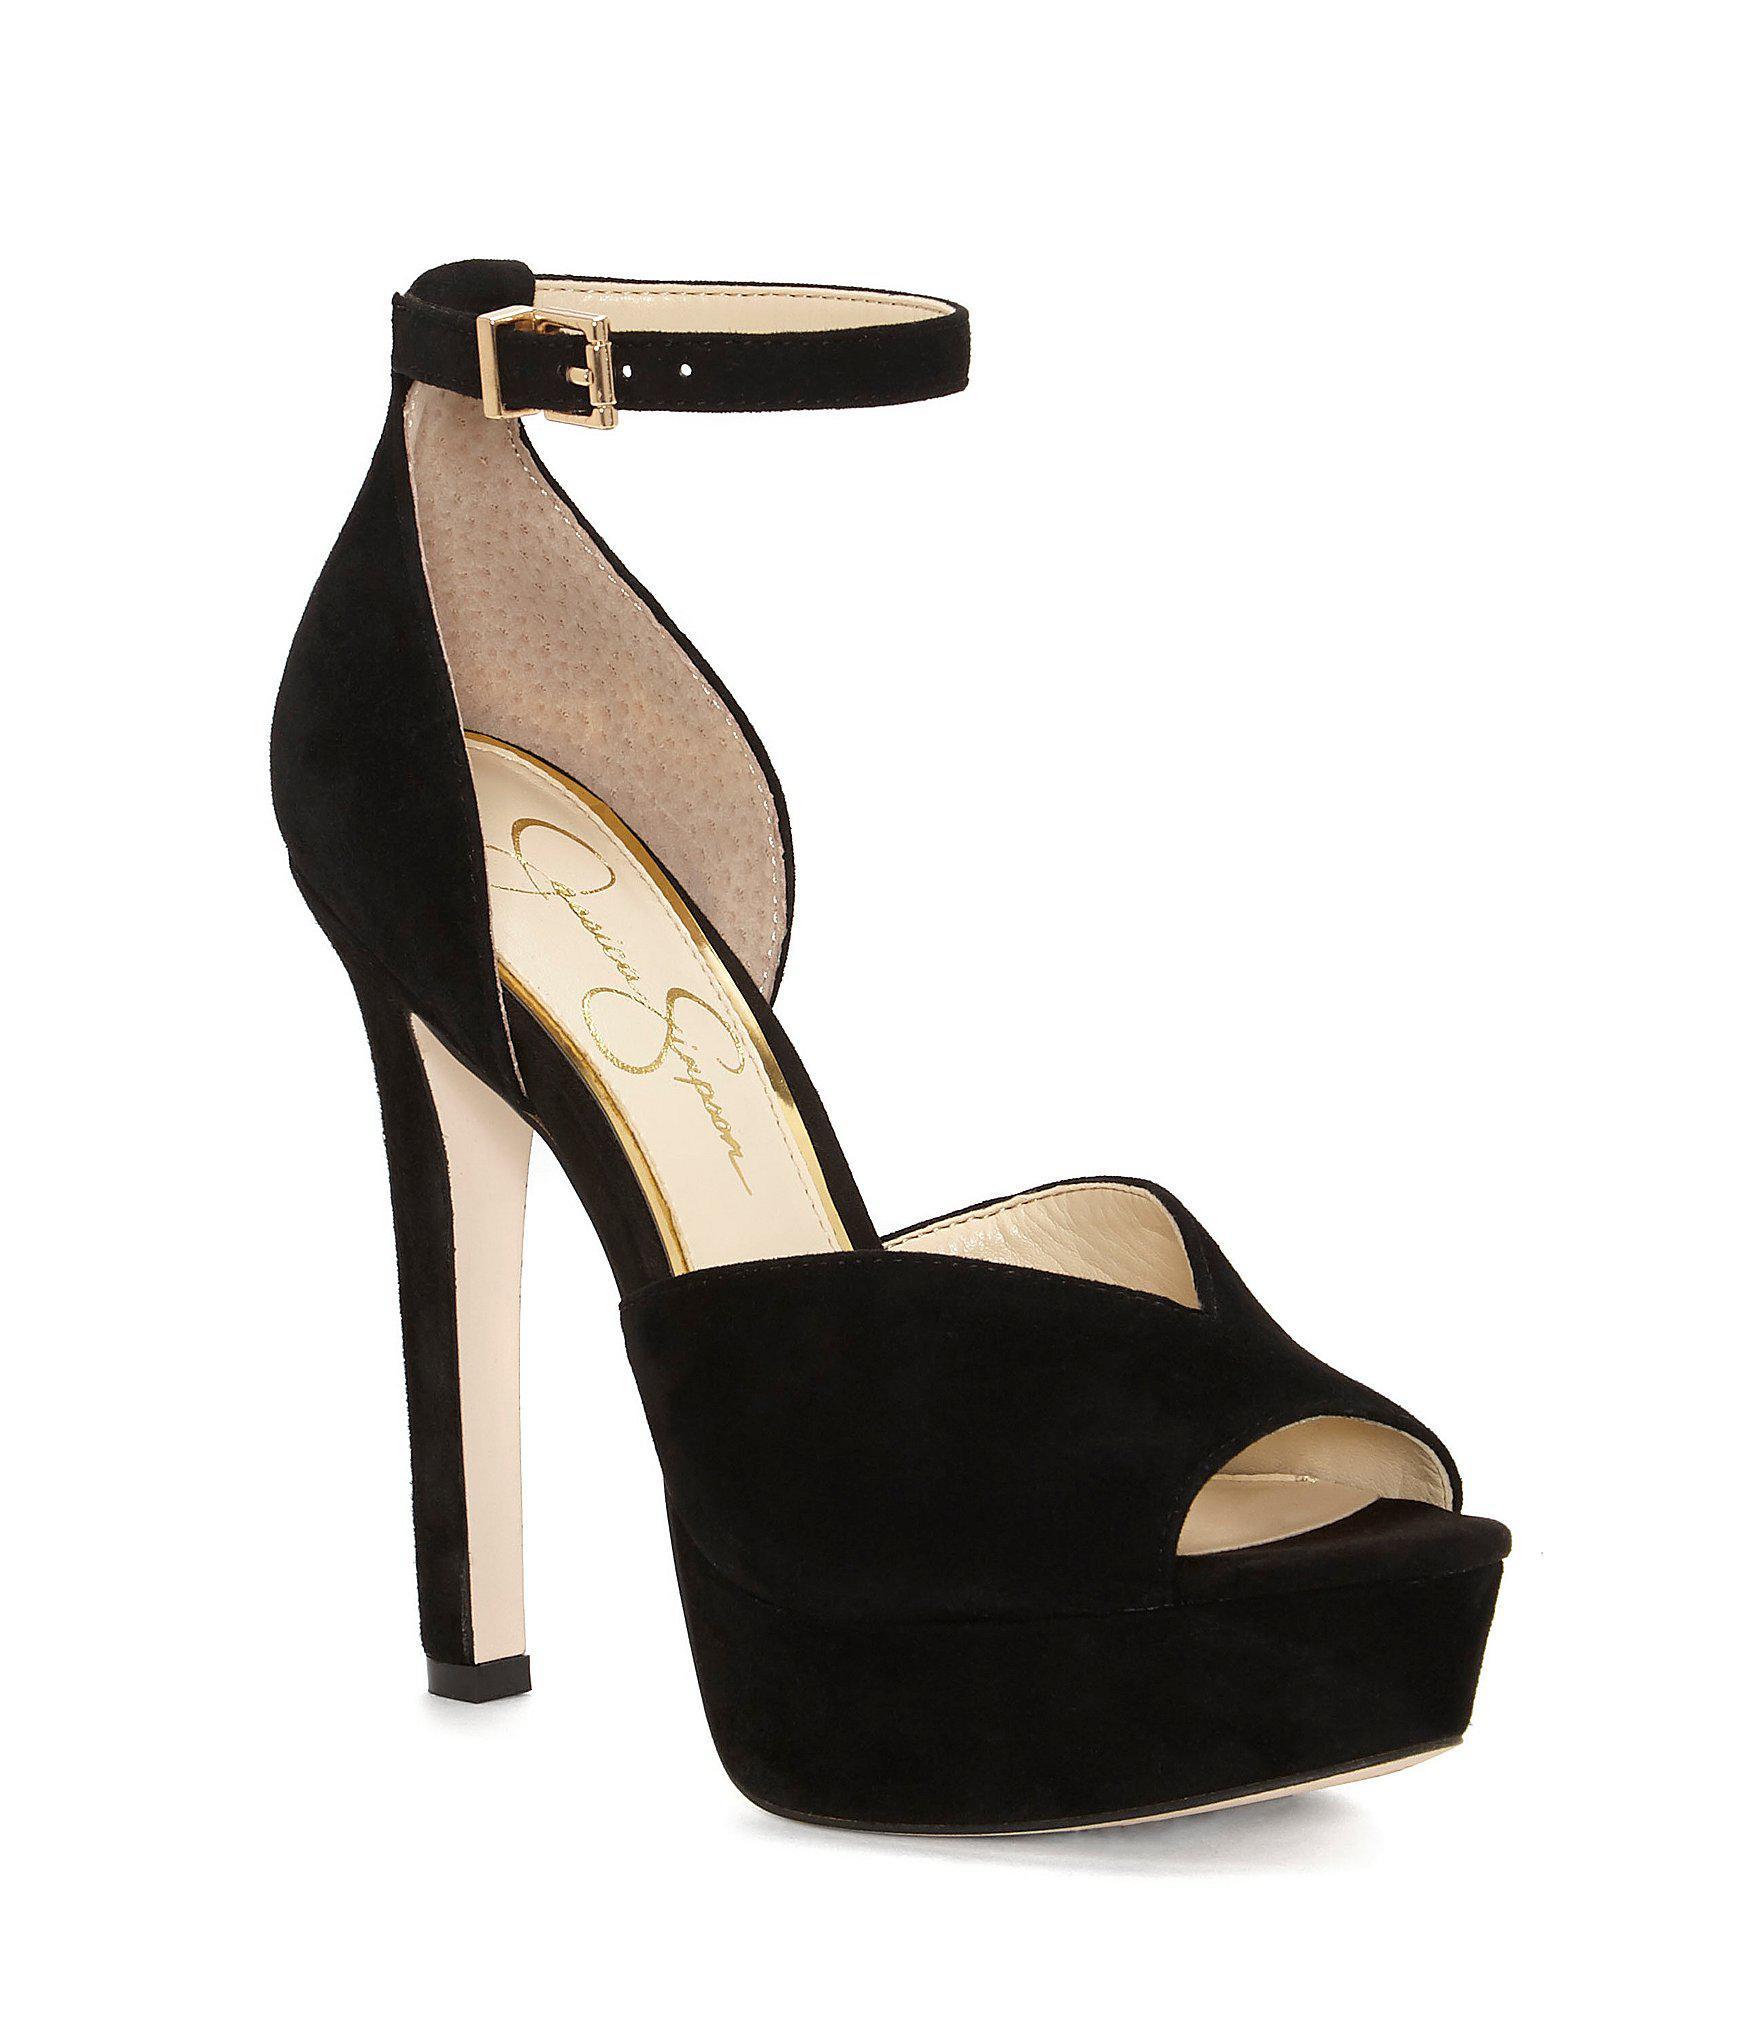 2c1e9d7c13 Lyst - Jessica Simpson Briya Suede Peep Toe Platform With Ankle ...